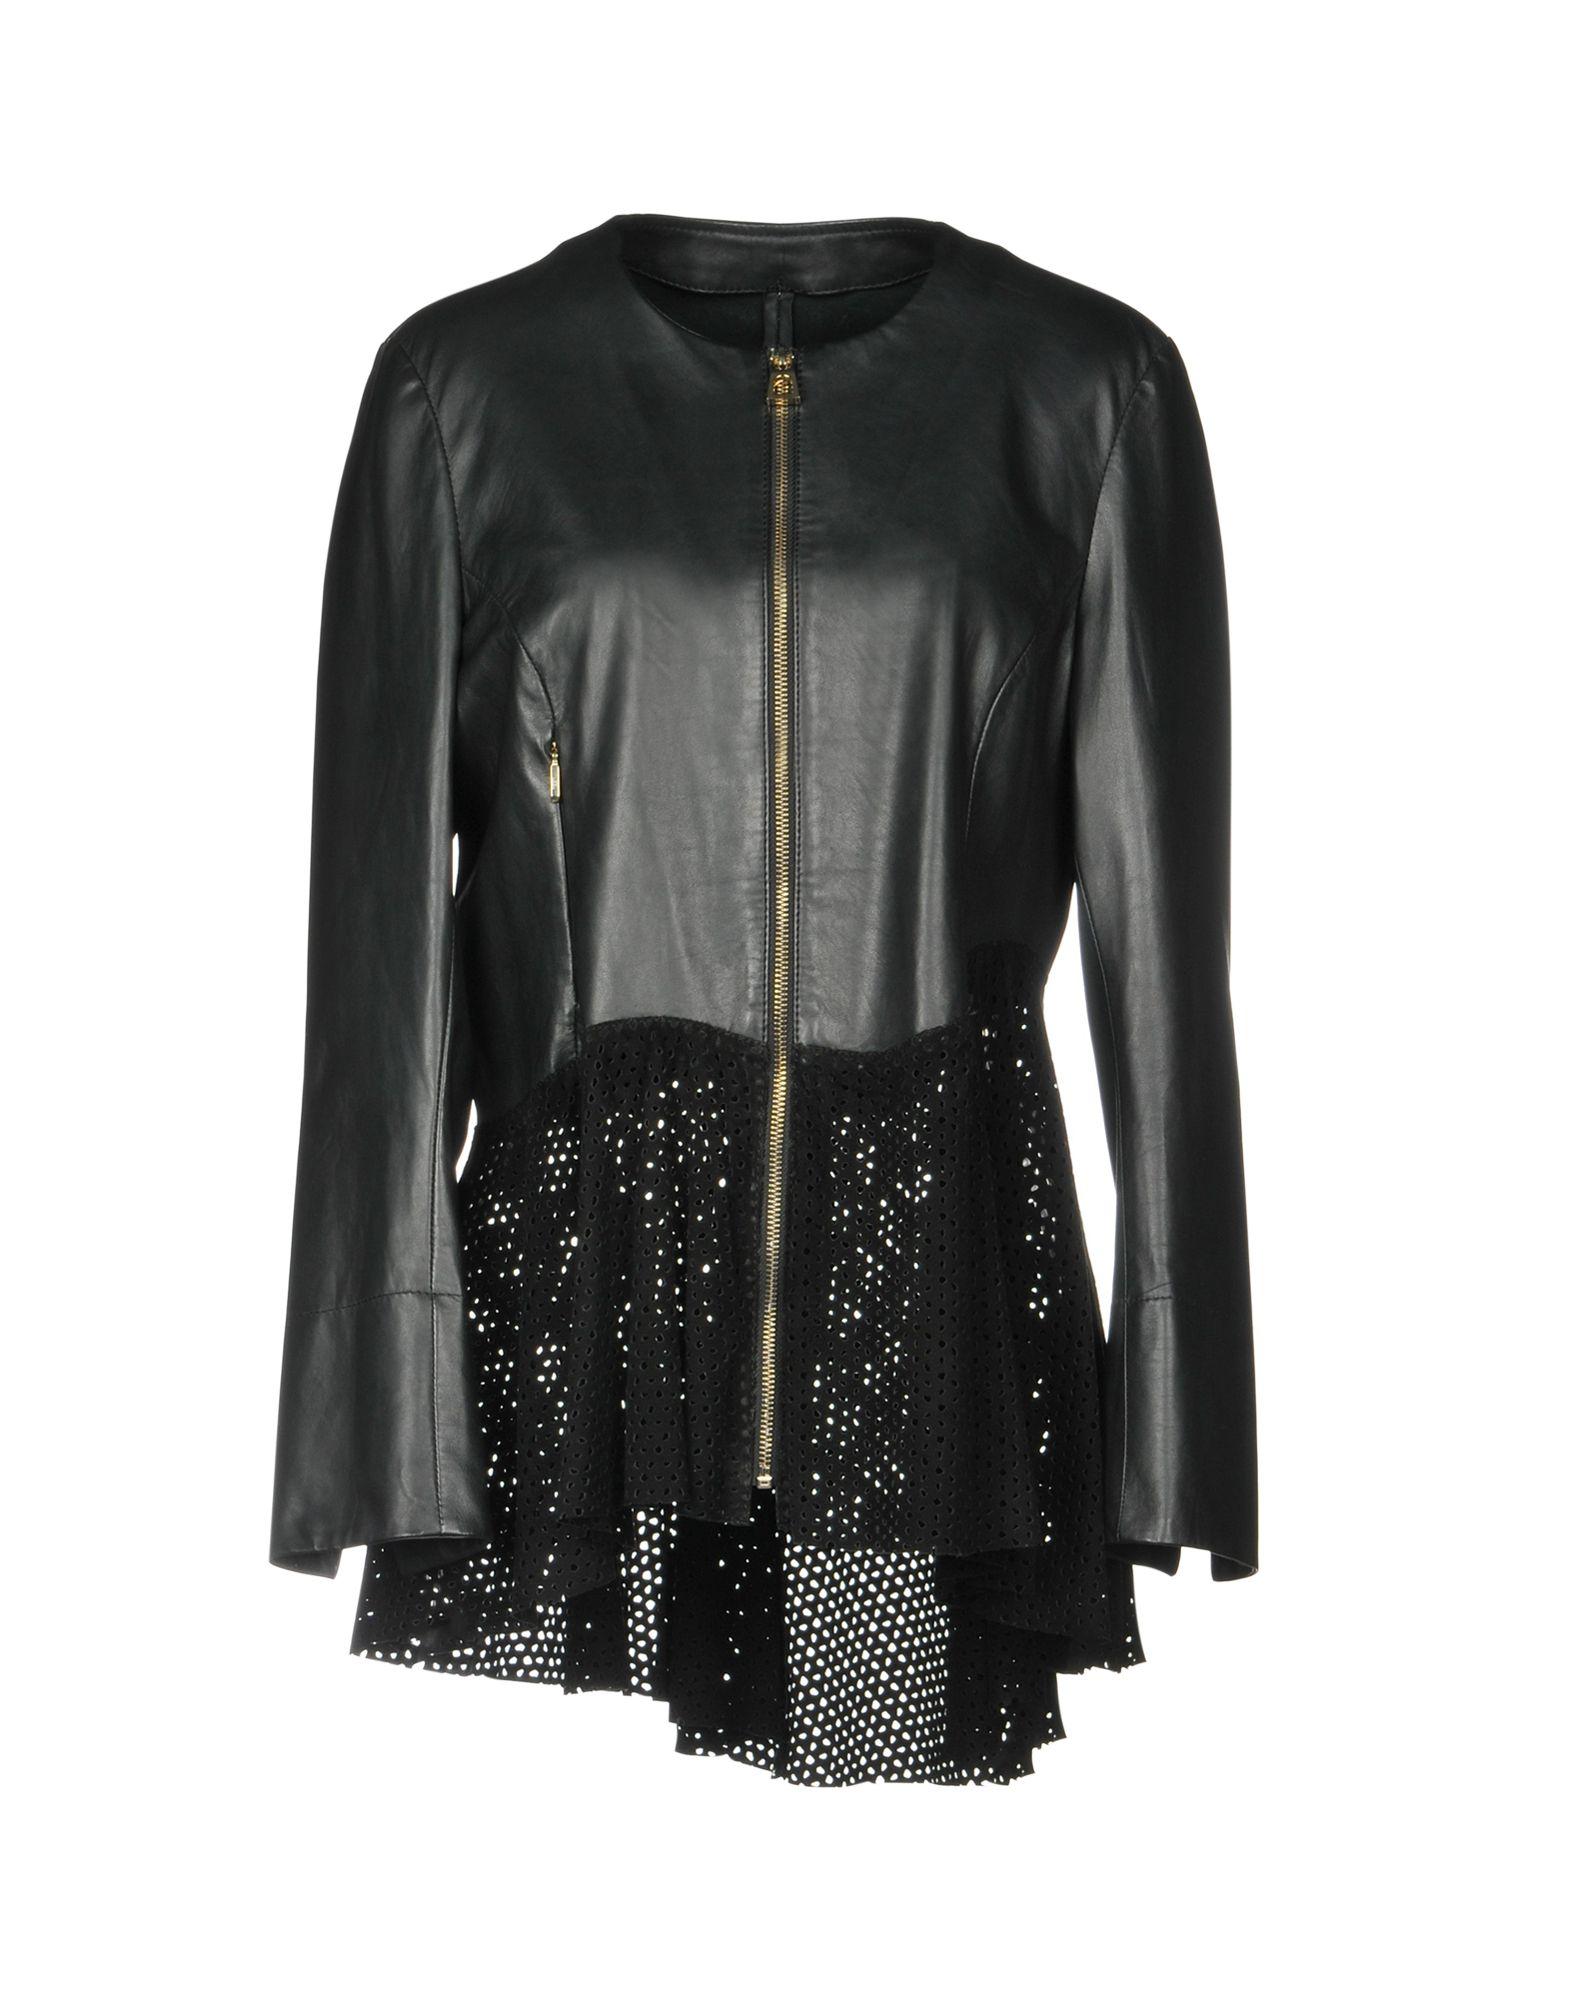 DIEGO M Leather Jacket in Black